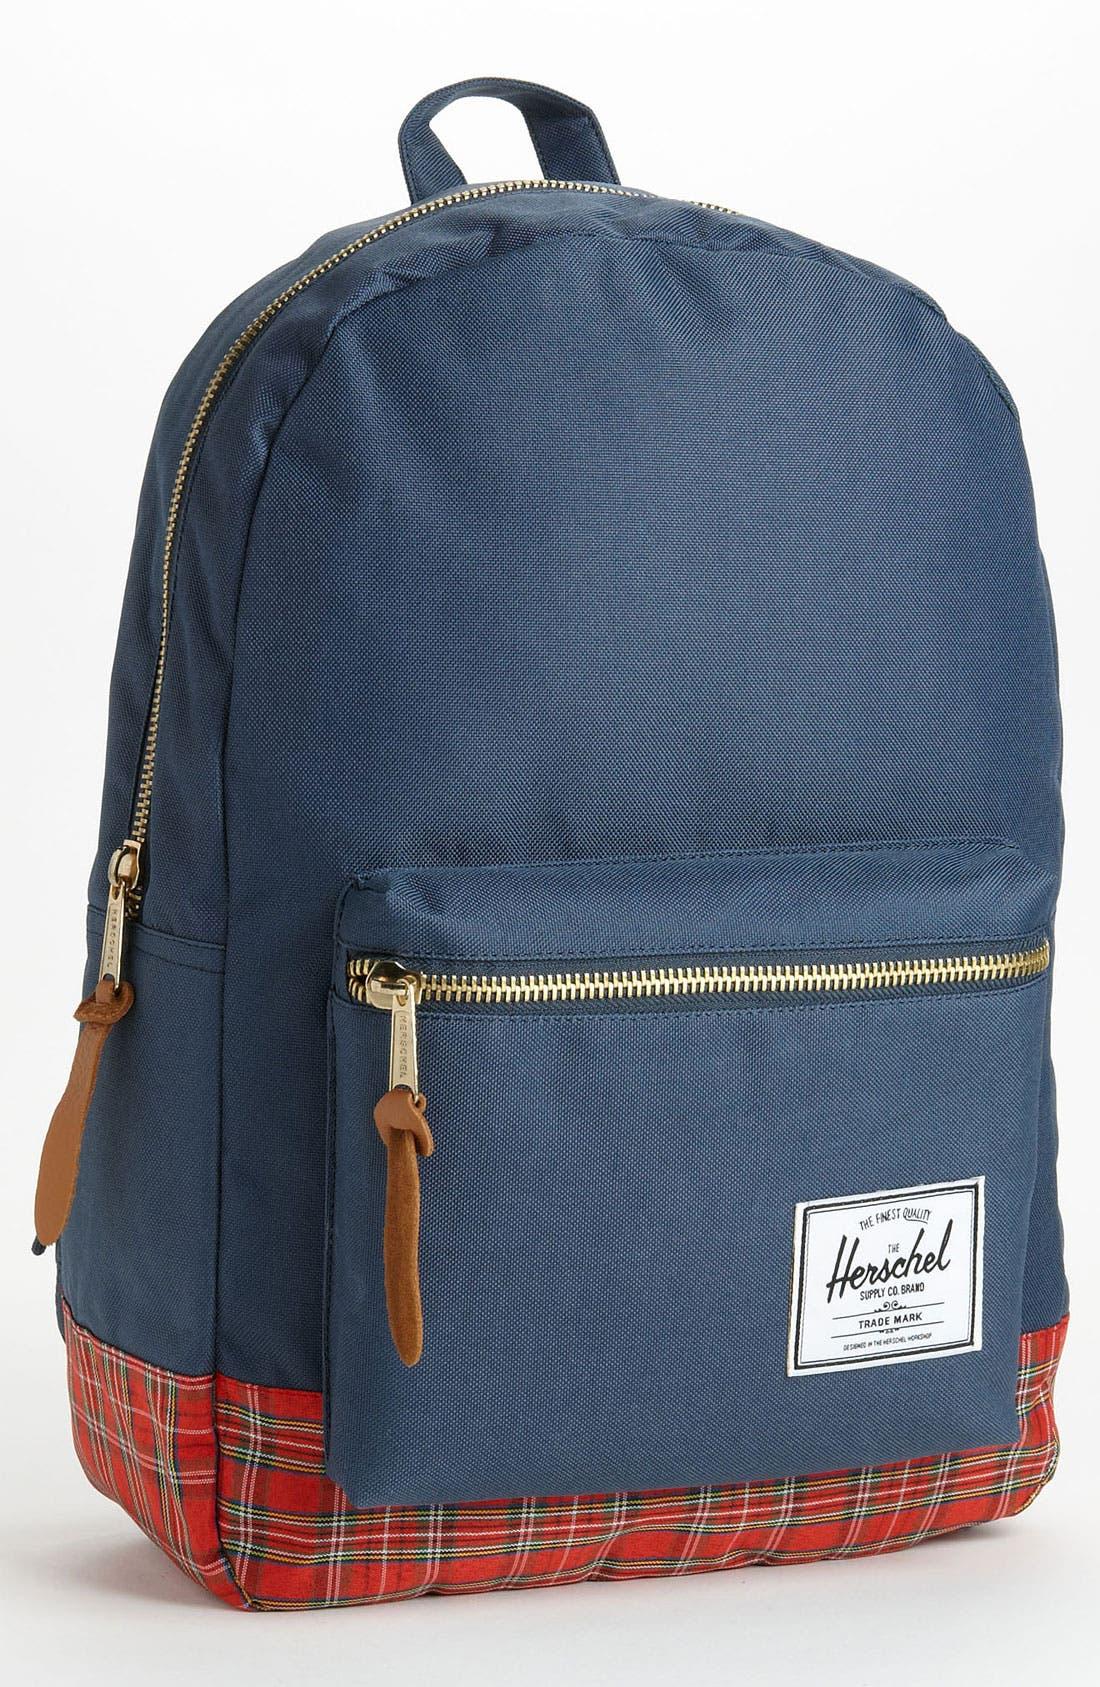 Alternate Image 1 Selected - Herschel Supply Co. 'Tartan Collection - Settlement' Backpack